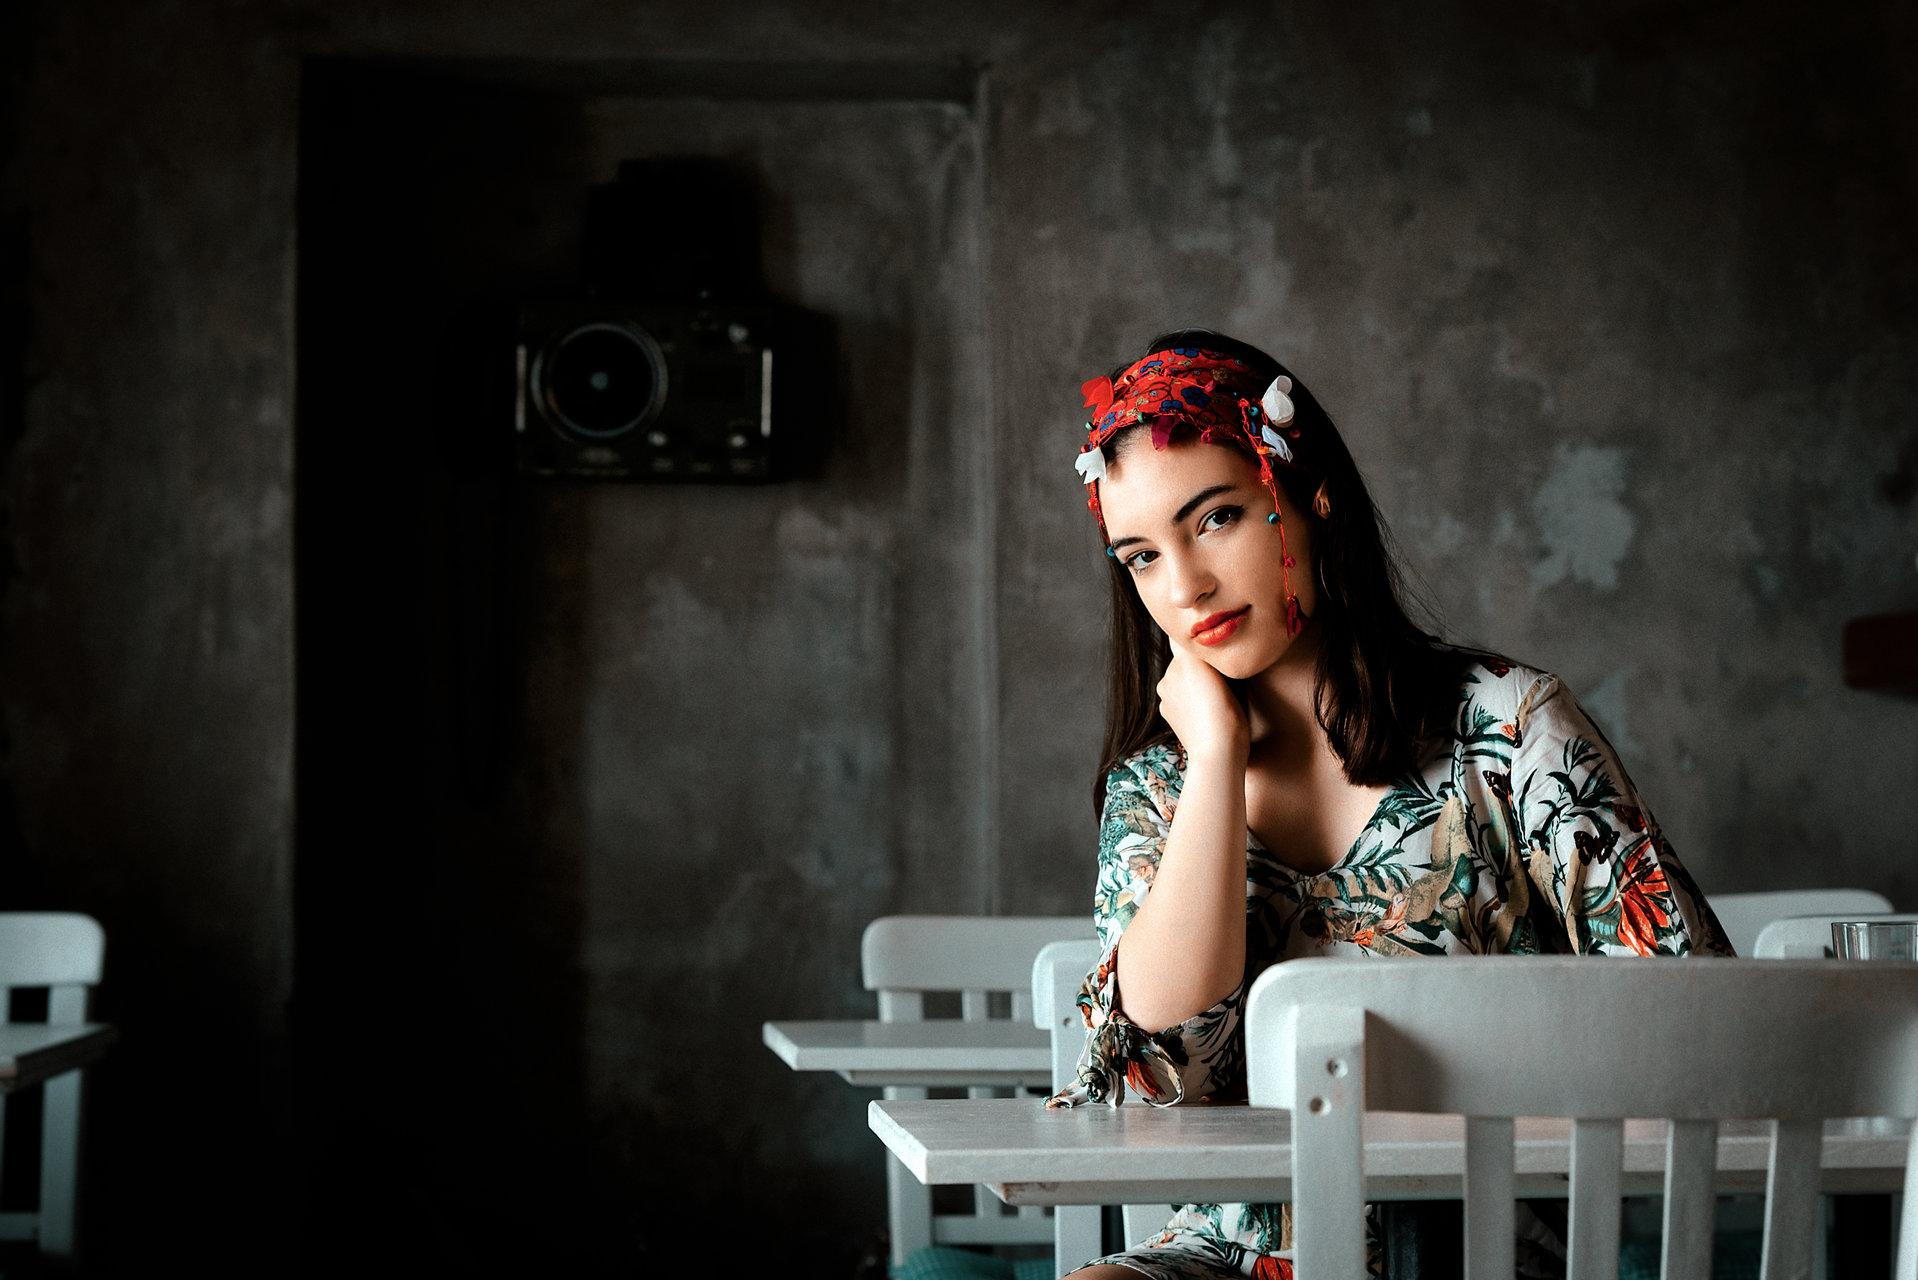 Photo in Portrait | Author poz_x | PHOTO FORUM